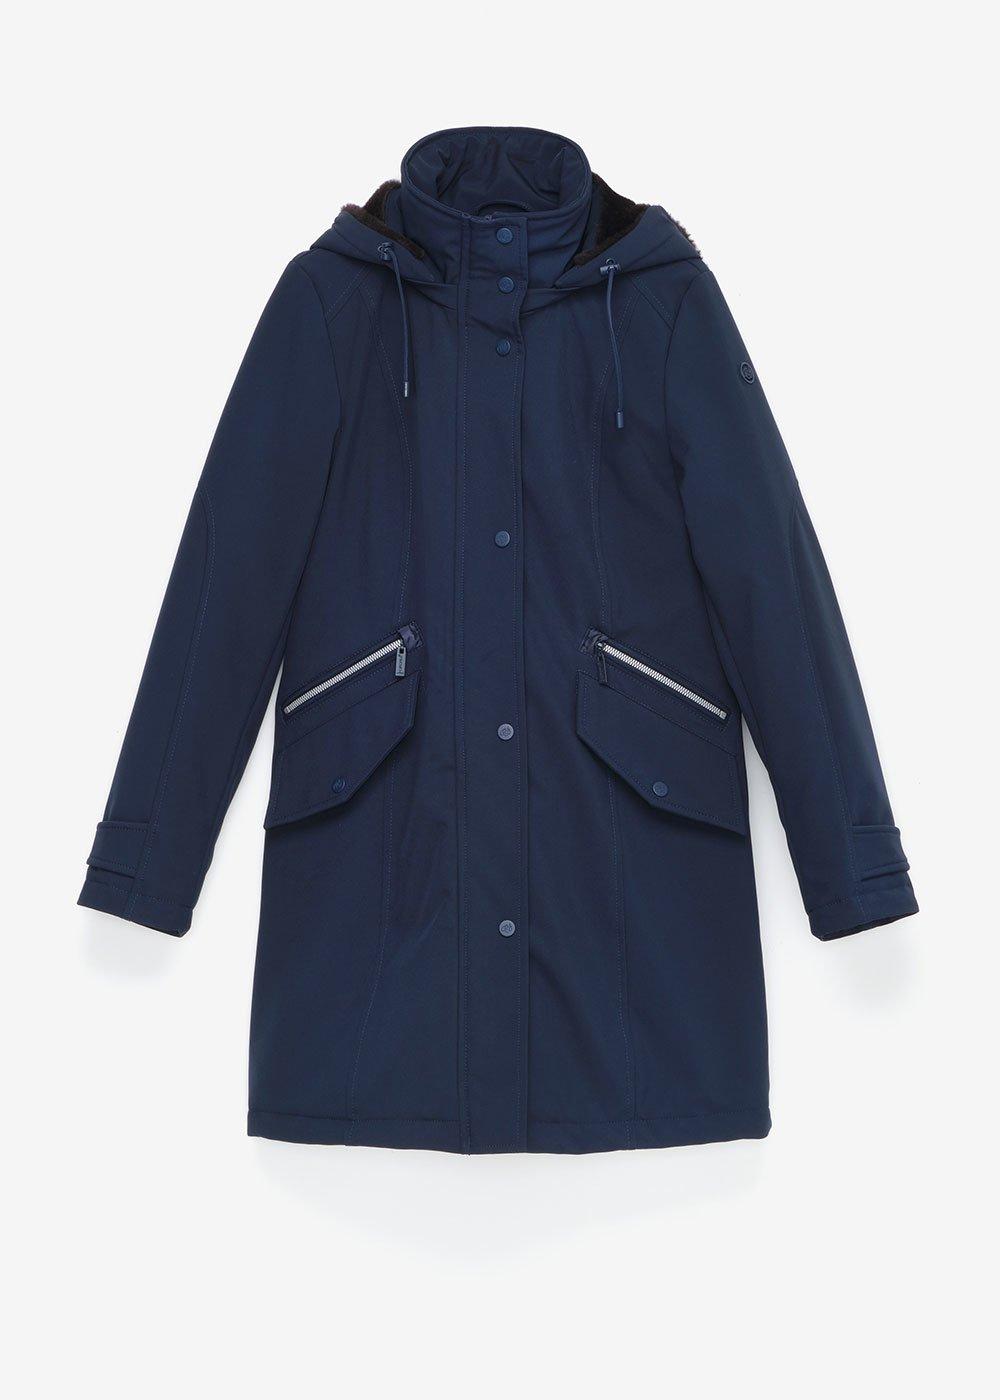 Pedros down jacket in technical fabric - Ultramarine - Woman